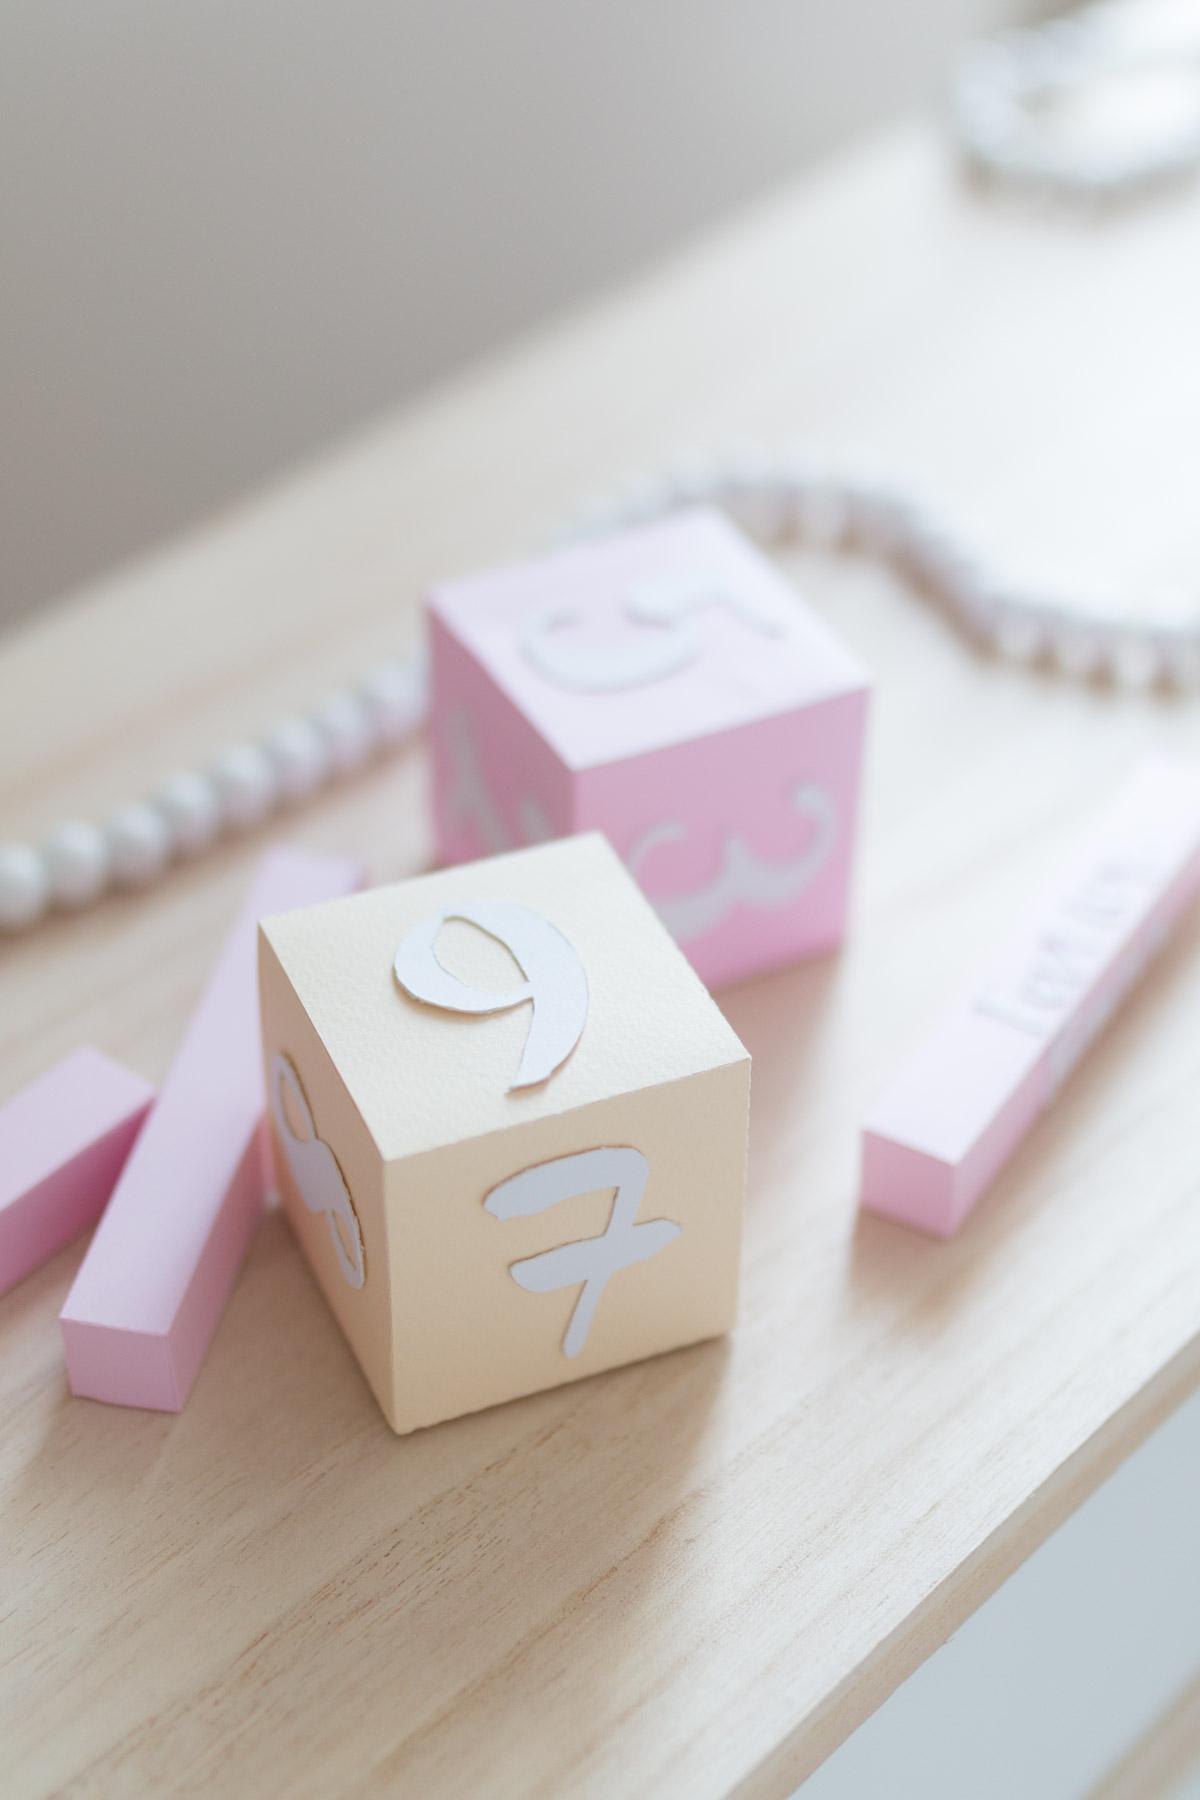 DIY Calendrier 3D en papier  I Sp4nkblog-14